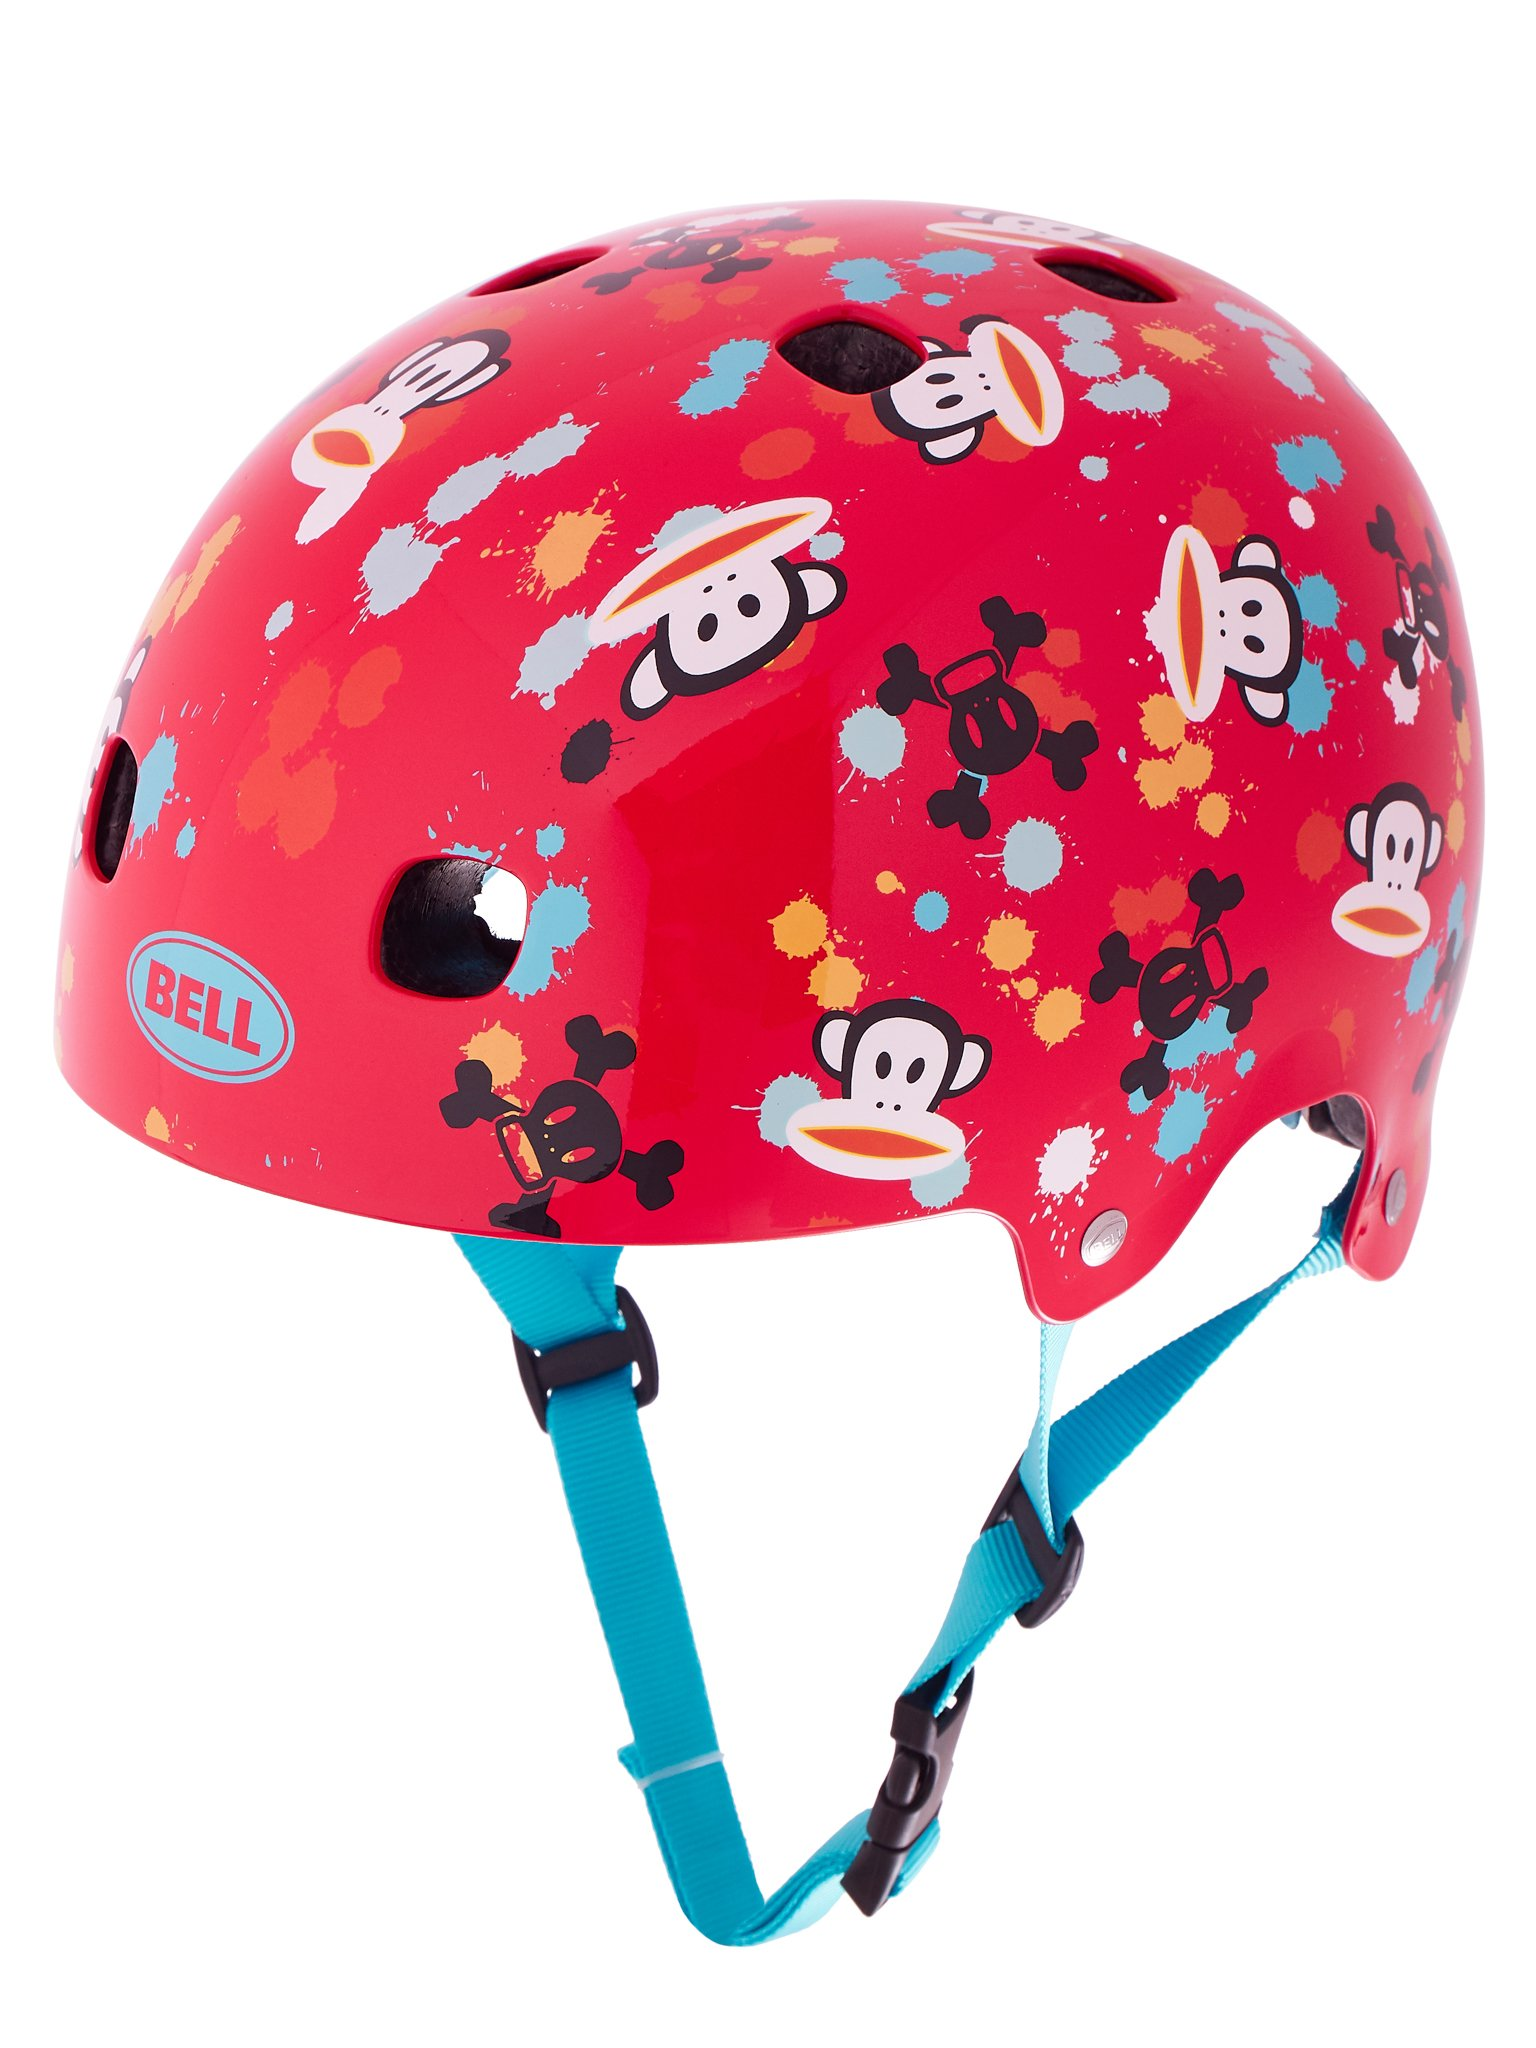 Bell Kinder Fahrradhelm Segment JR, Red Paul Frank Paint Ball, 48-53 cm, 2100930